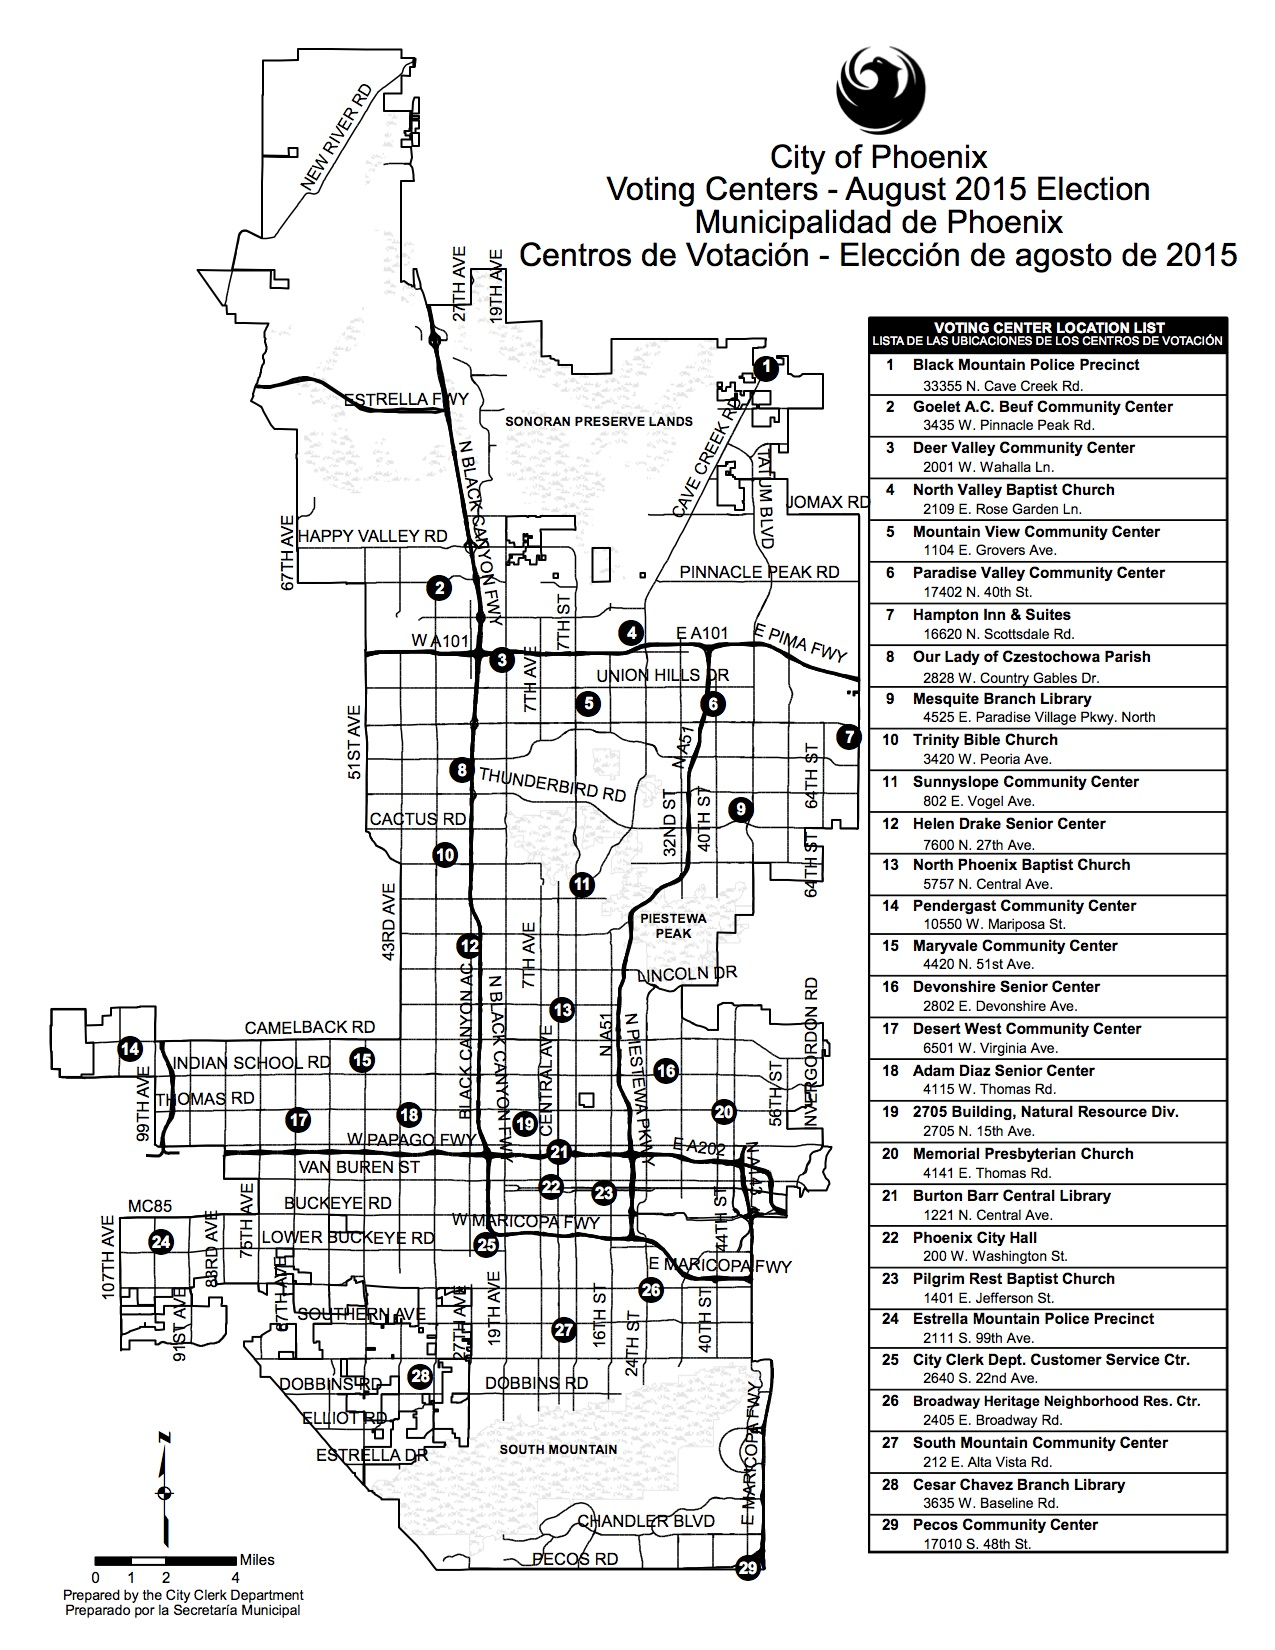 Voting-Center-Locations-2015-FINAL.jpg.jpg